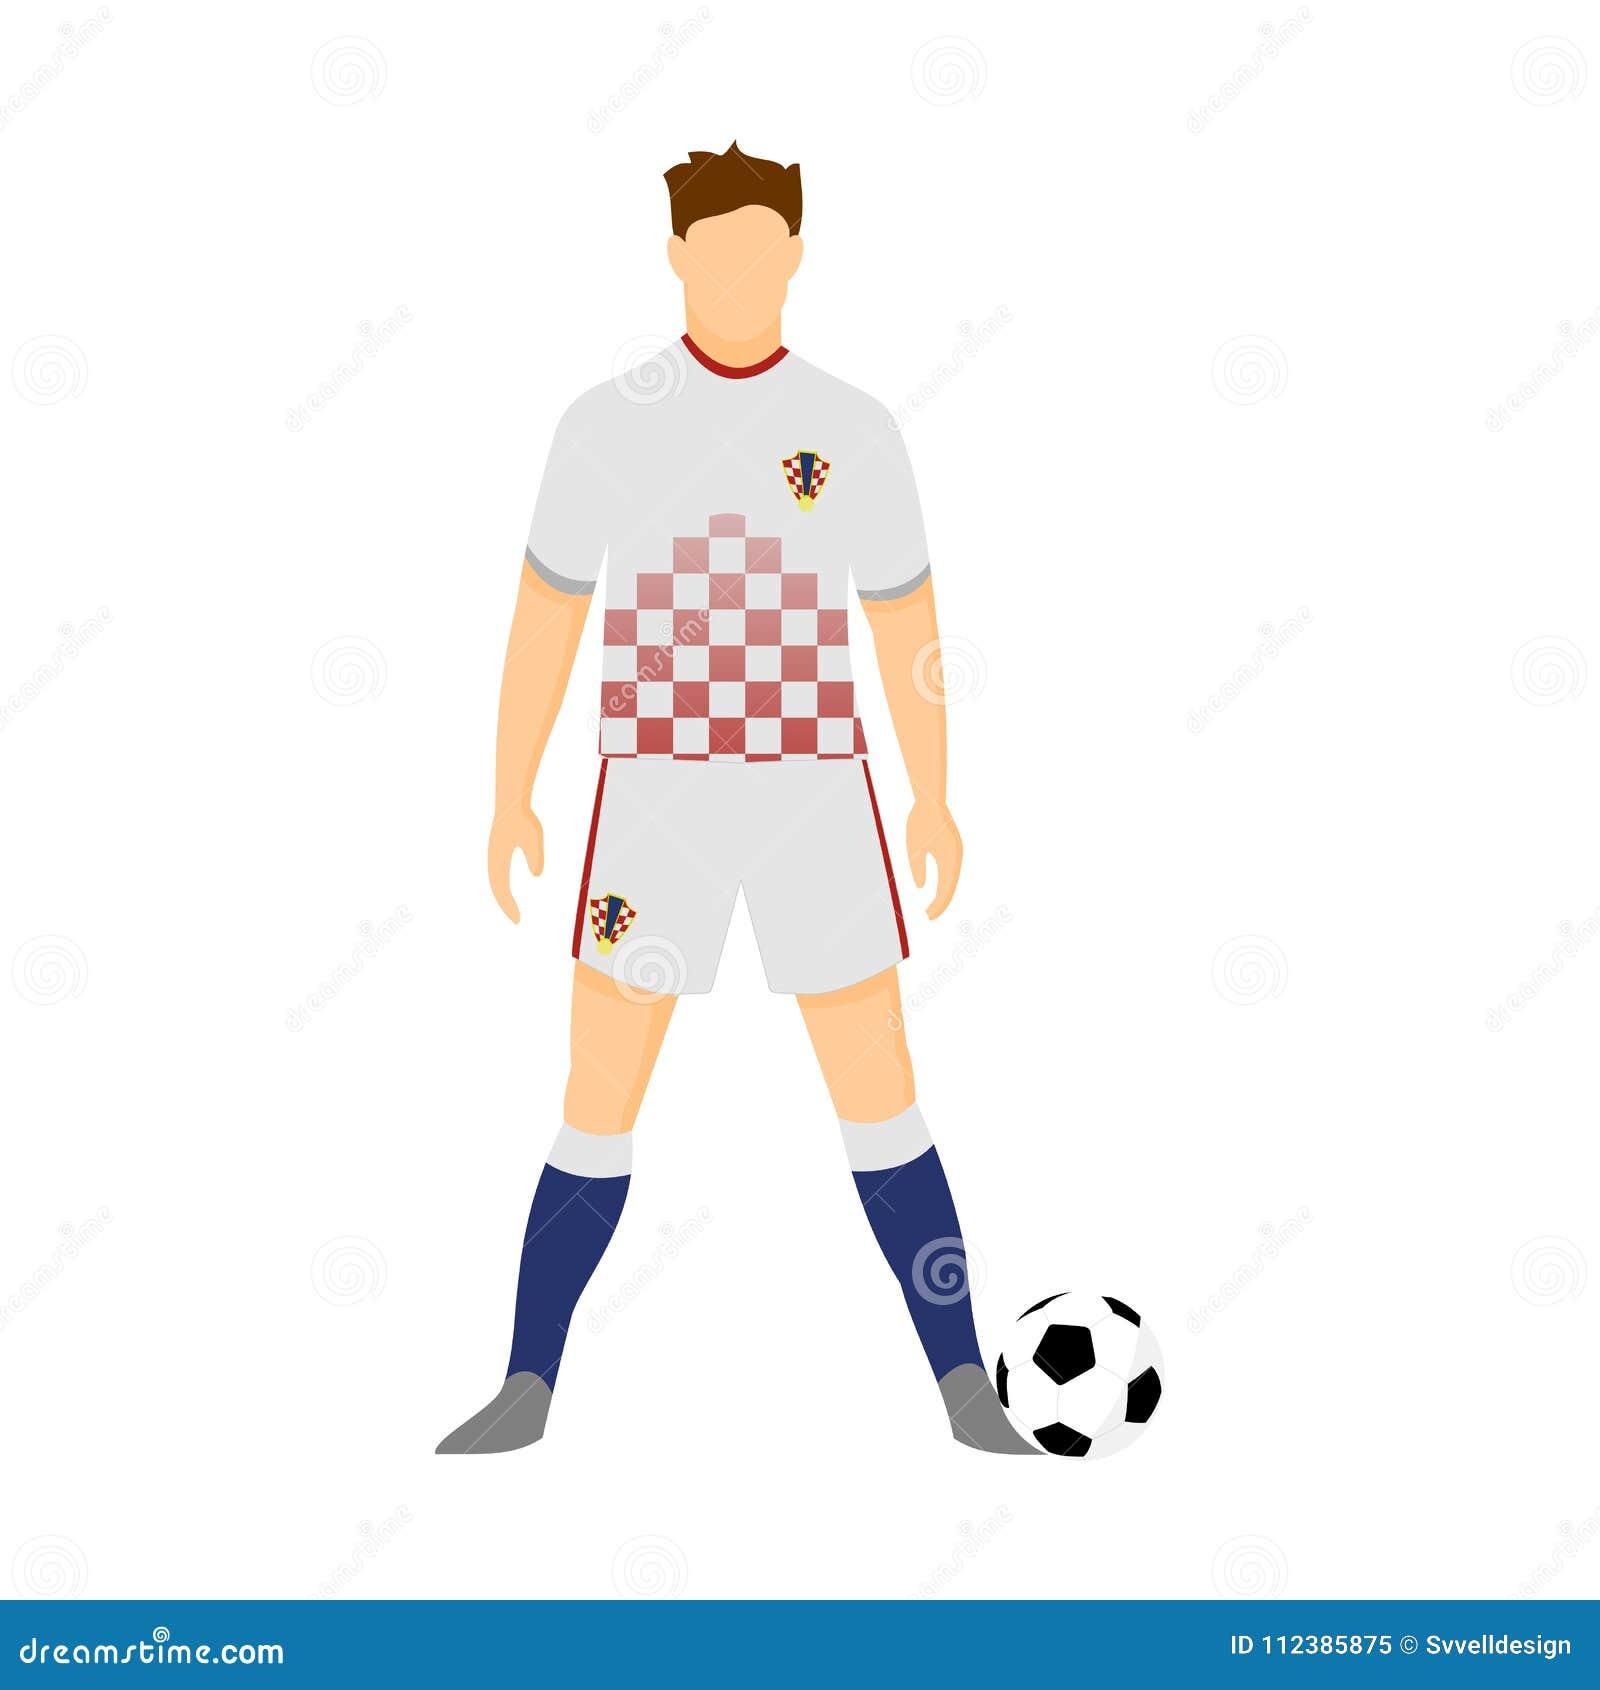 Croatia Football Jersey National Team World Cup Vector Illustration Graphic  Design 050032b18